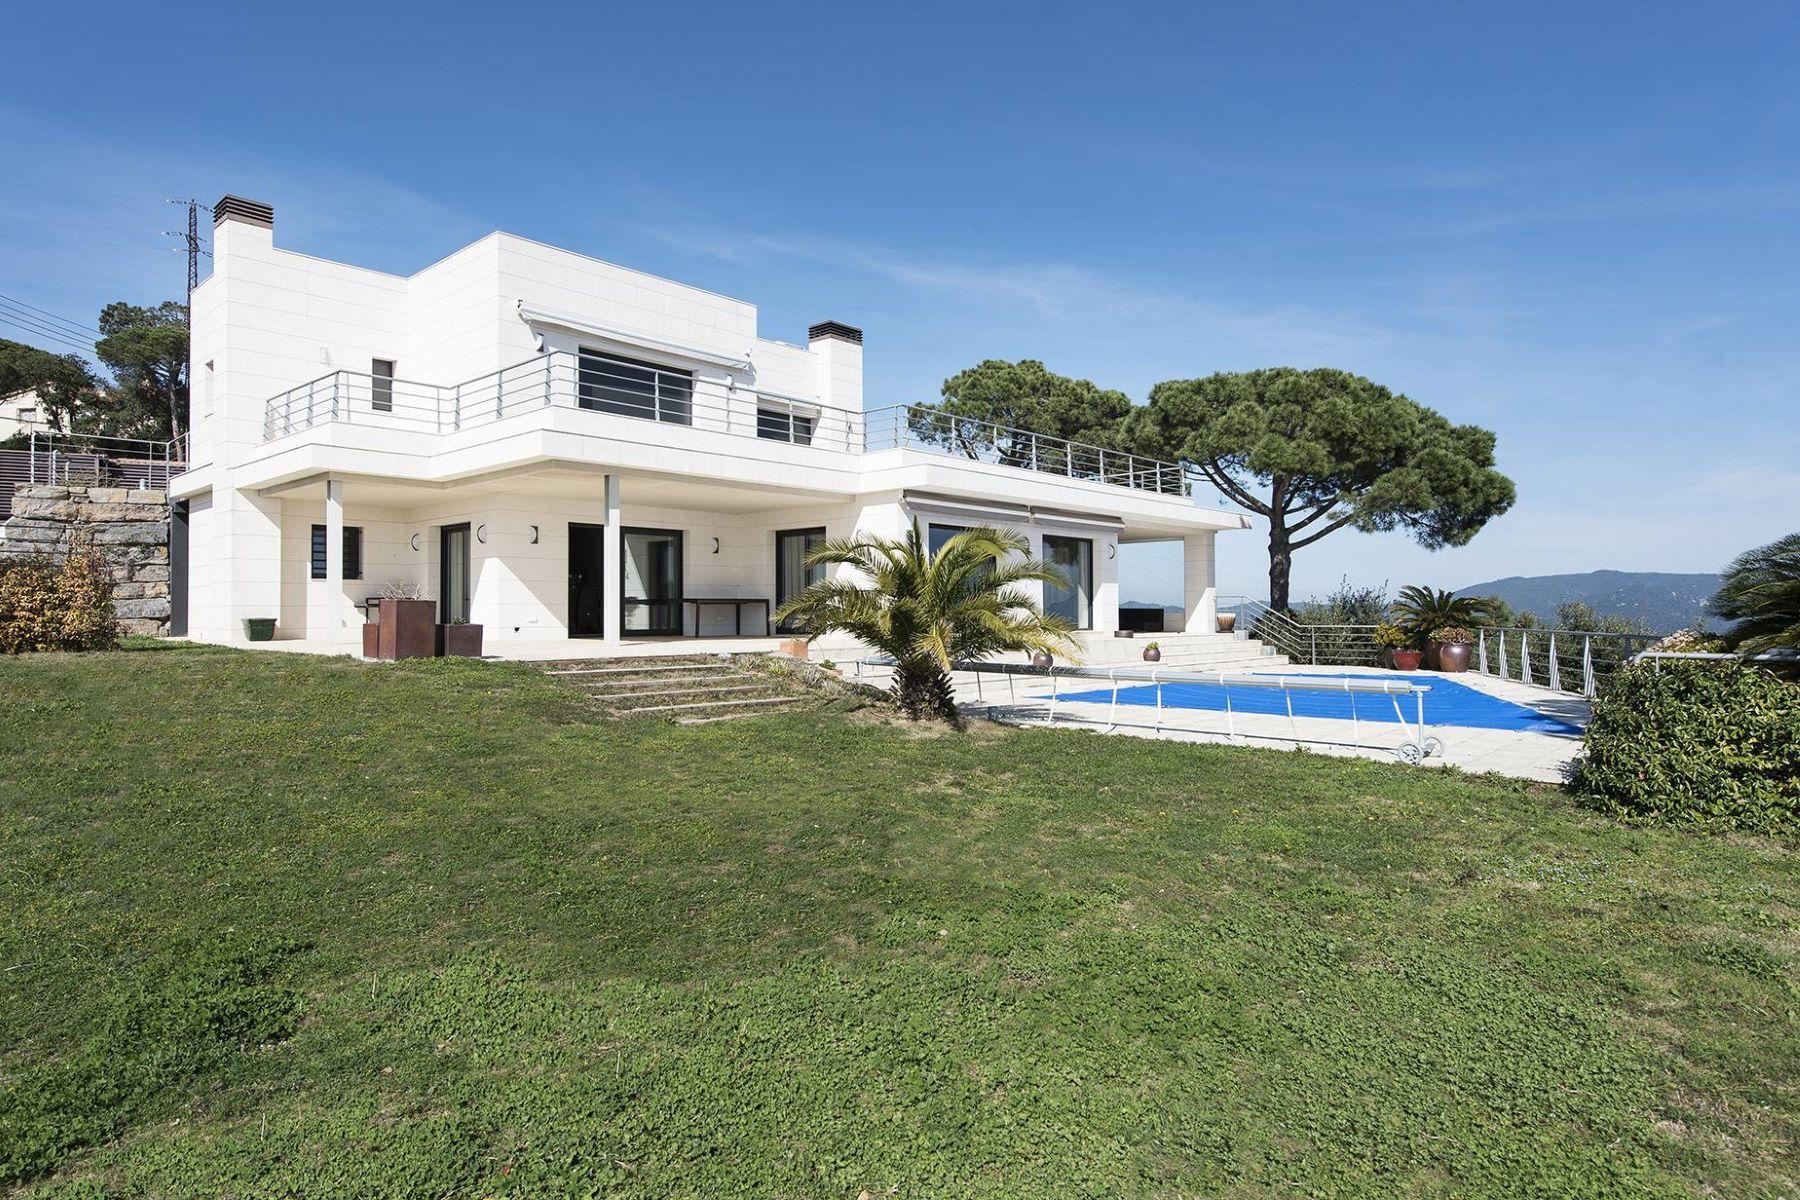 独户住宅 为 销售 在 Magnificent villa in privileged area in Lloret de Mar 略雷特德马尔, 科斯塔布拉瓦, 17310 西班牙